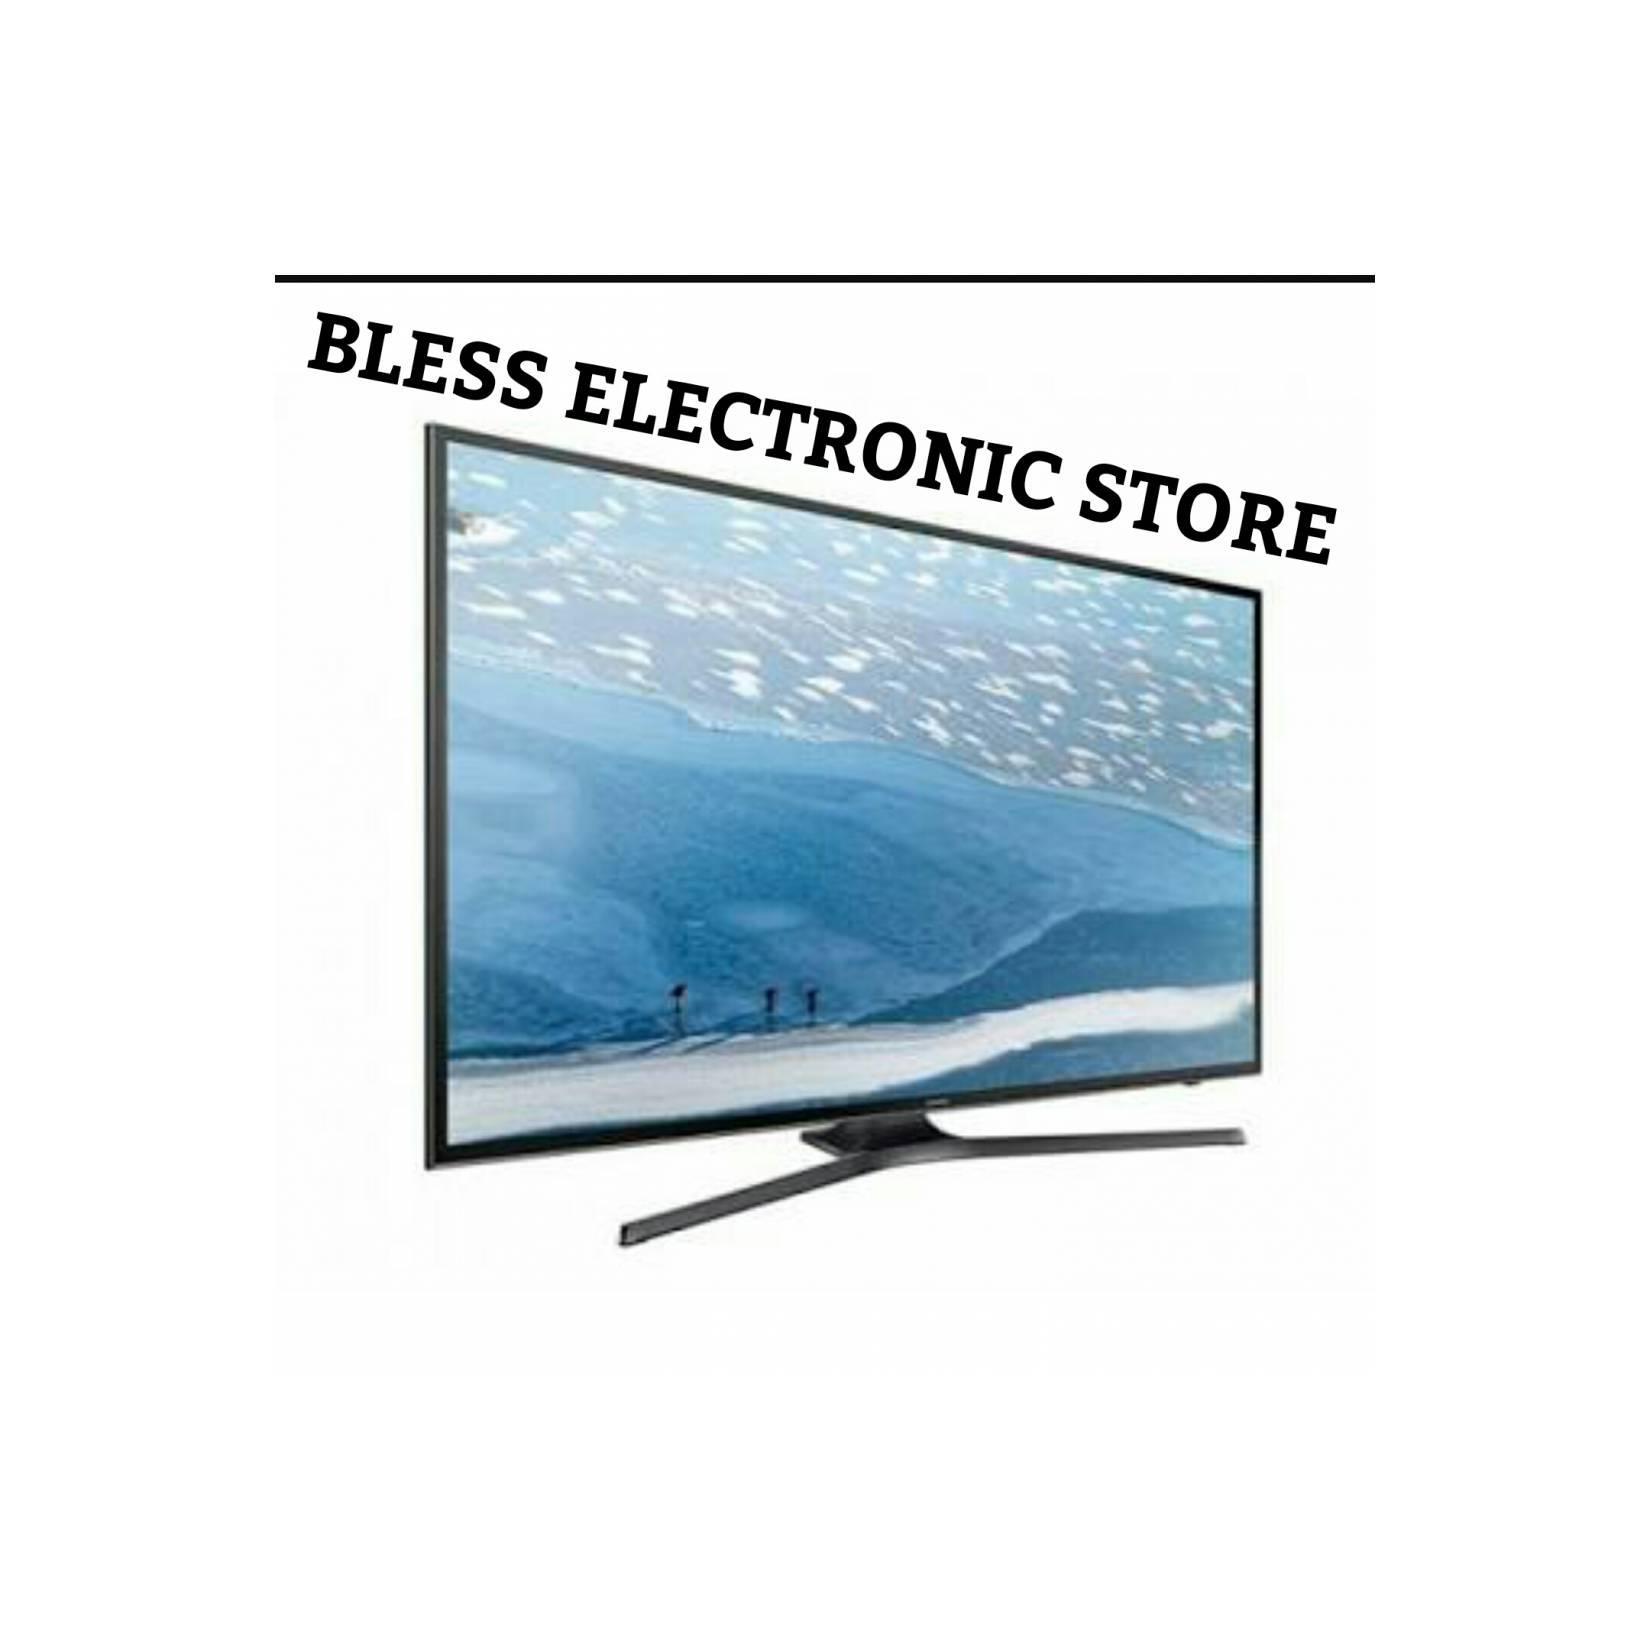 Samsung Led Tv 43 Seri K5002 Fhd Ua 43k5002 Hitam Khusus Jabodetabek Lg 43lh500t Inch Full Hd Promo Murah